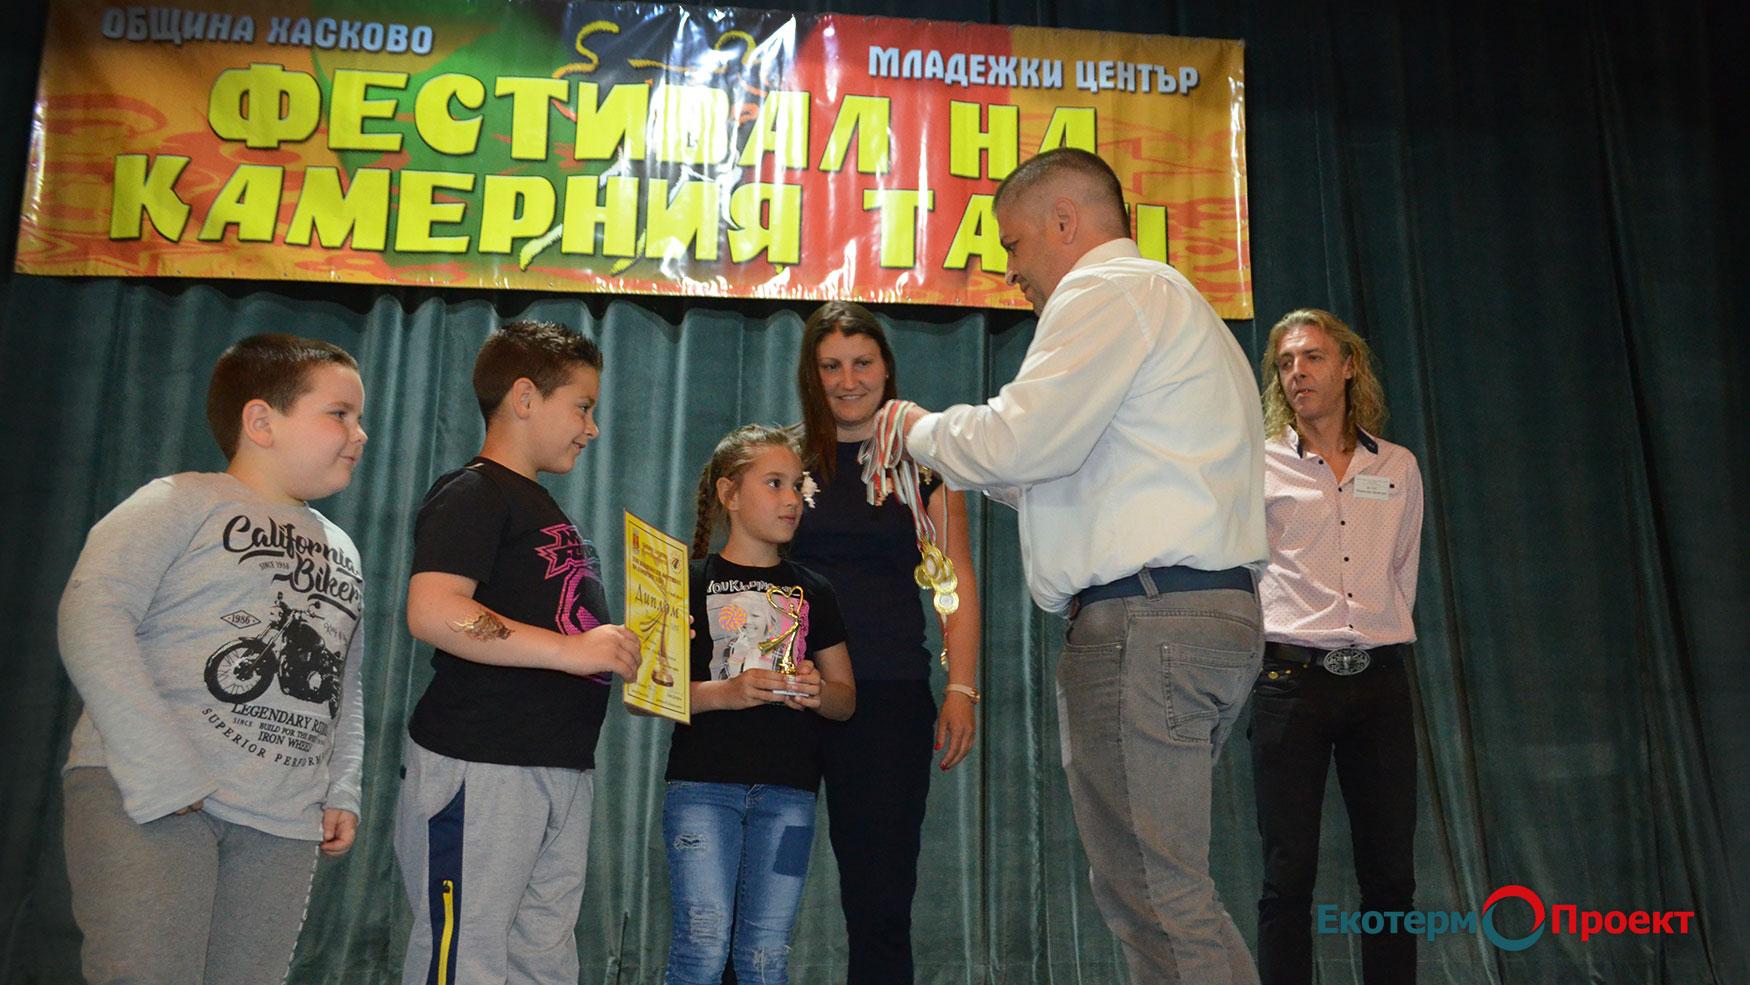 Ekoterm-Proekt-dance-donation-03_04-2019-a